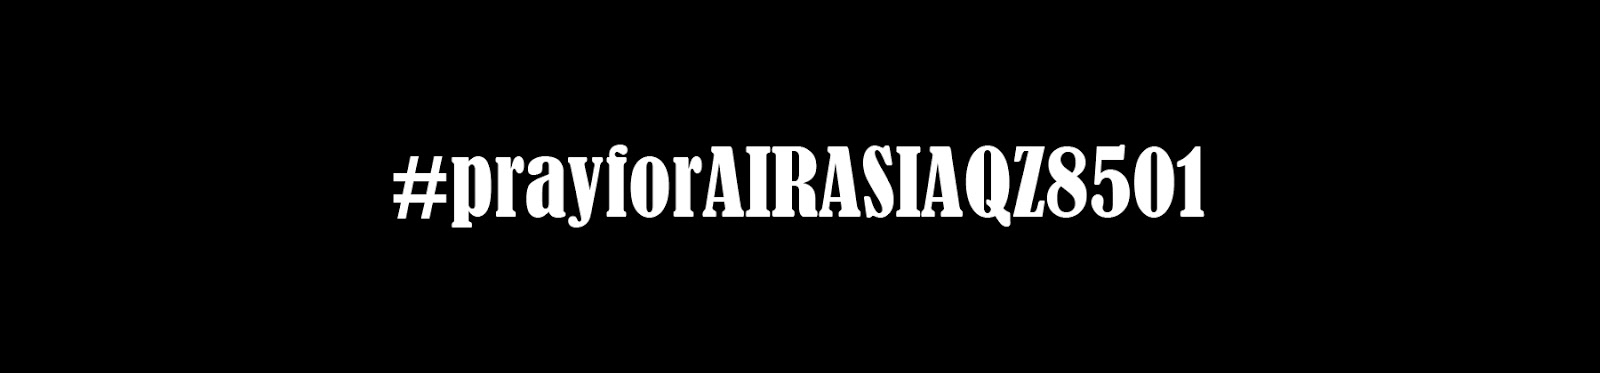 pray, prayfirairaisa, prayforqz8501, qz8501, pesawat hilang